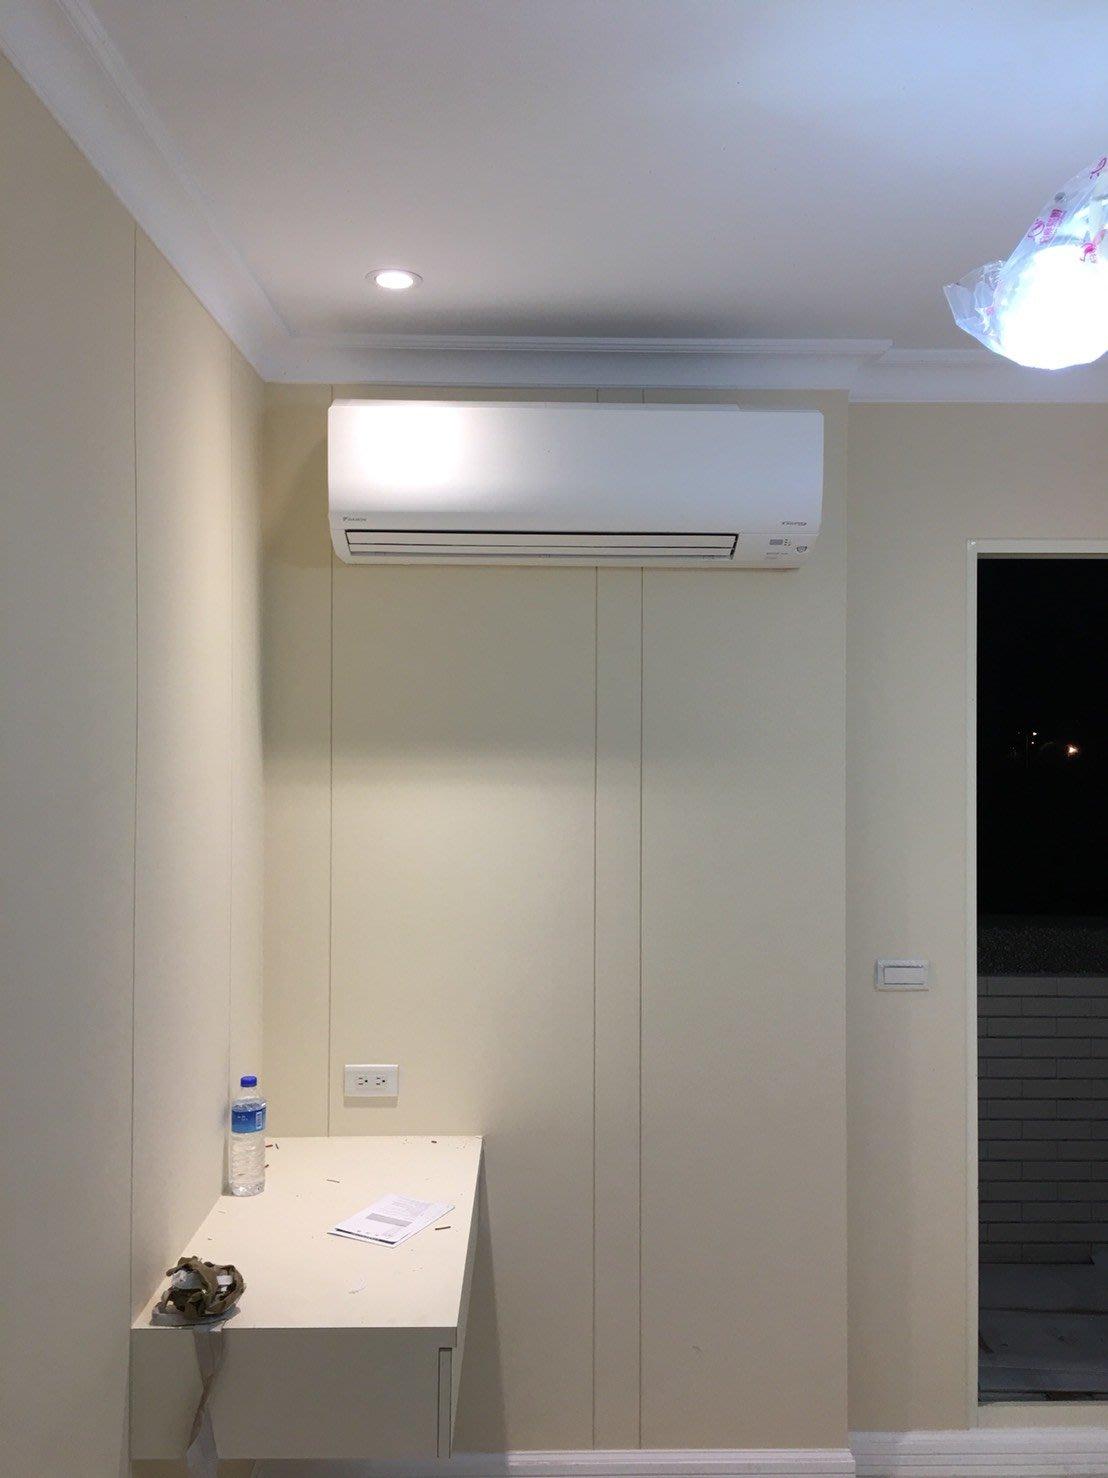 《CHO空調》《RXV90SVLT FTXV90SVLT》大金冷氣16~18坪非90NK 90NX FTXM90RVLT